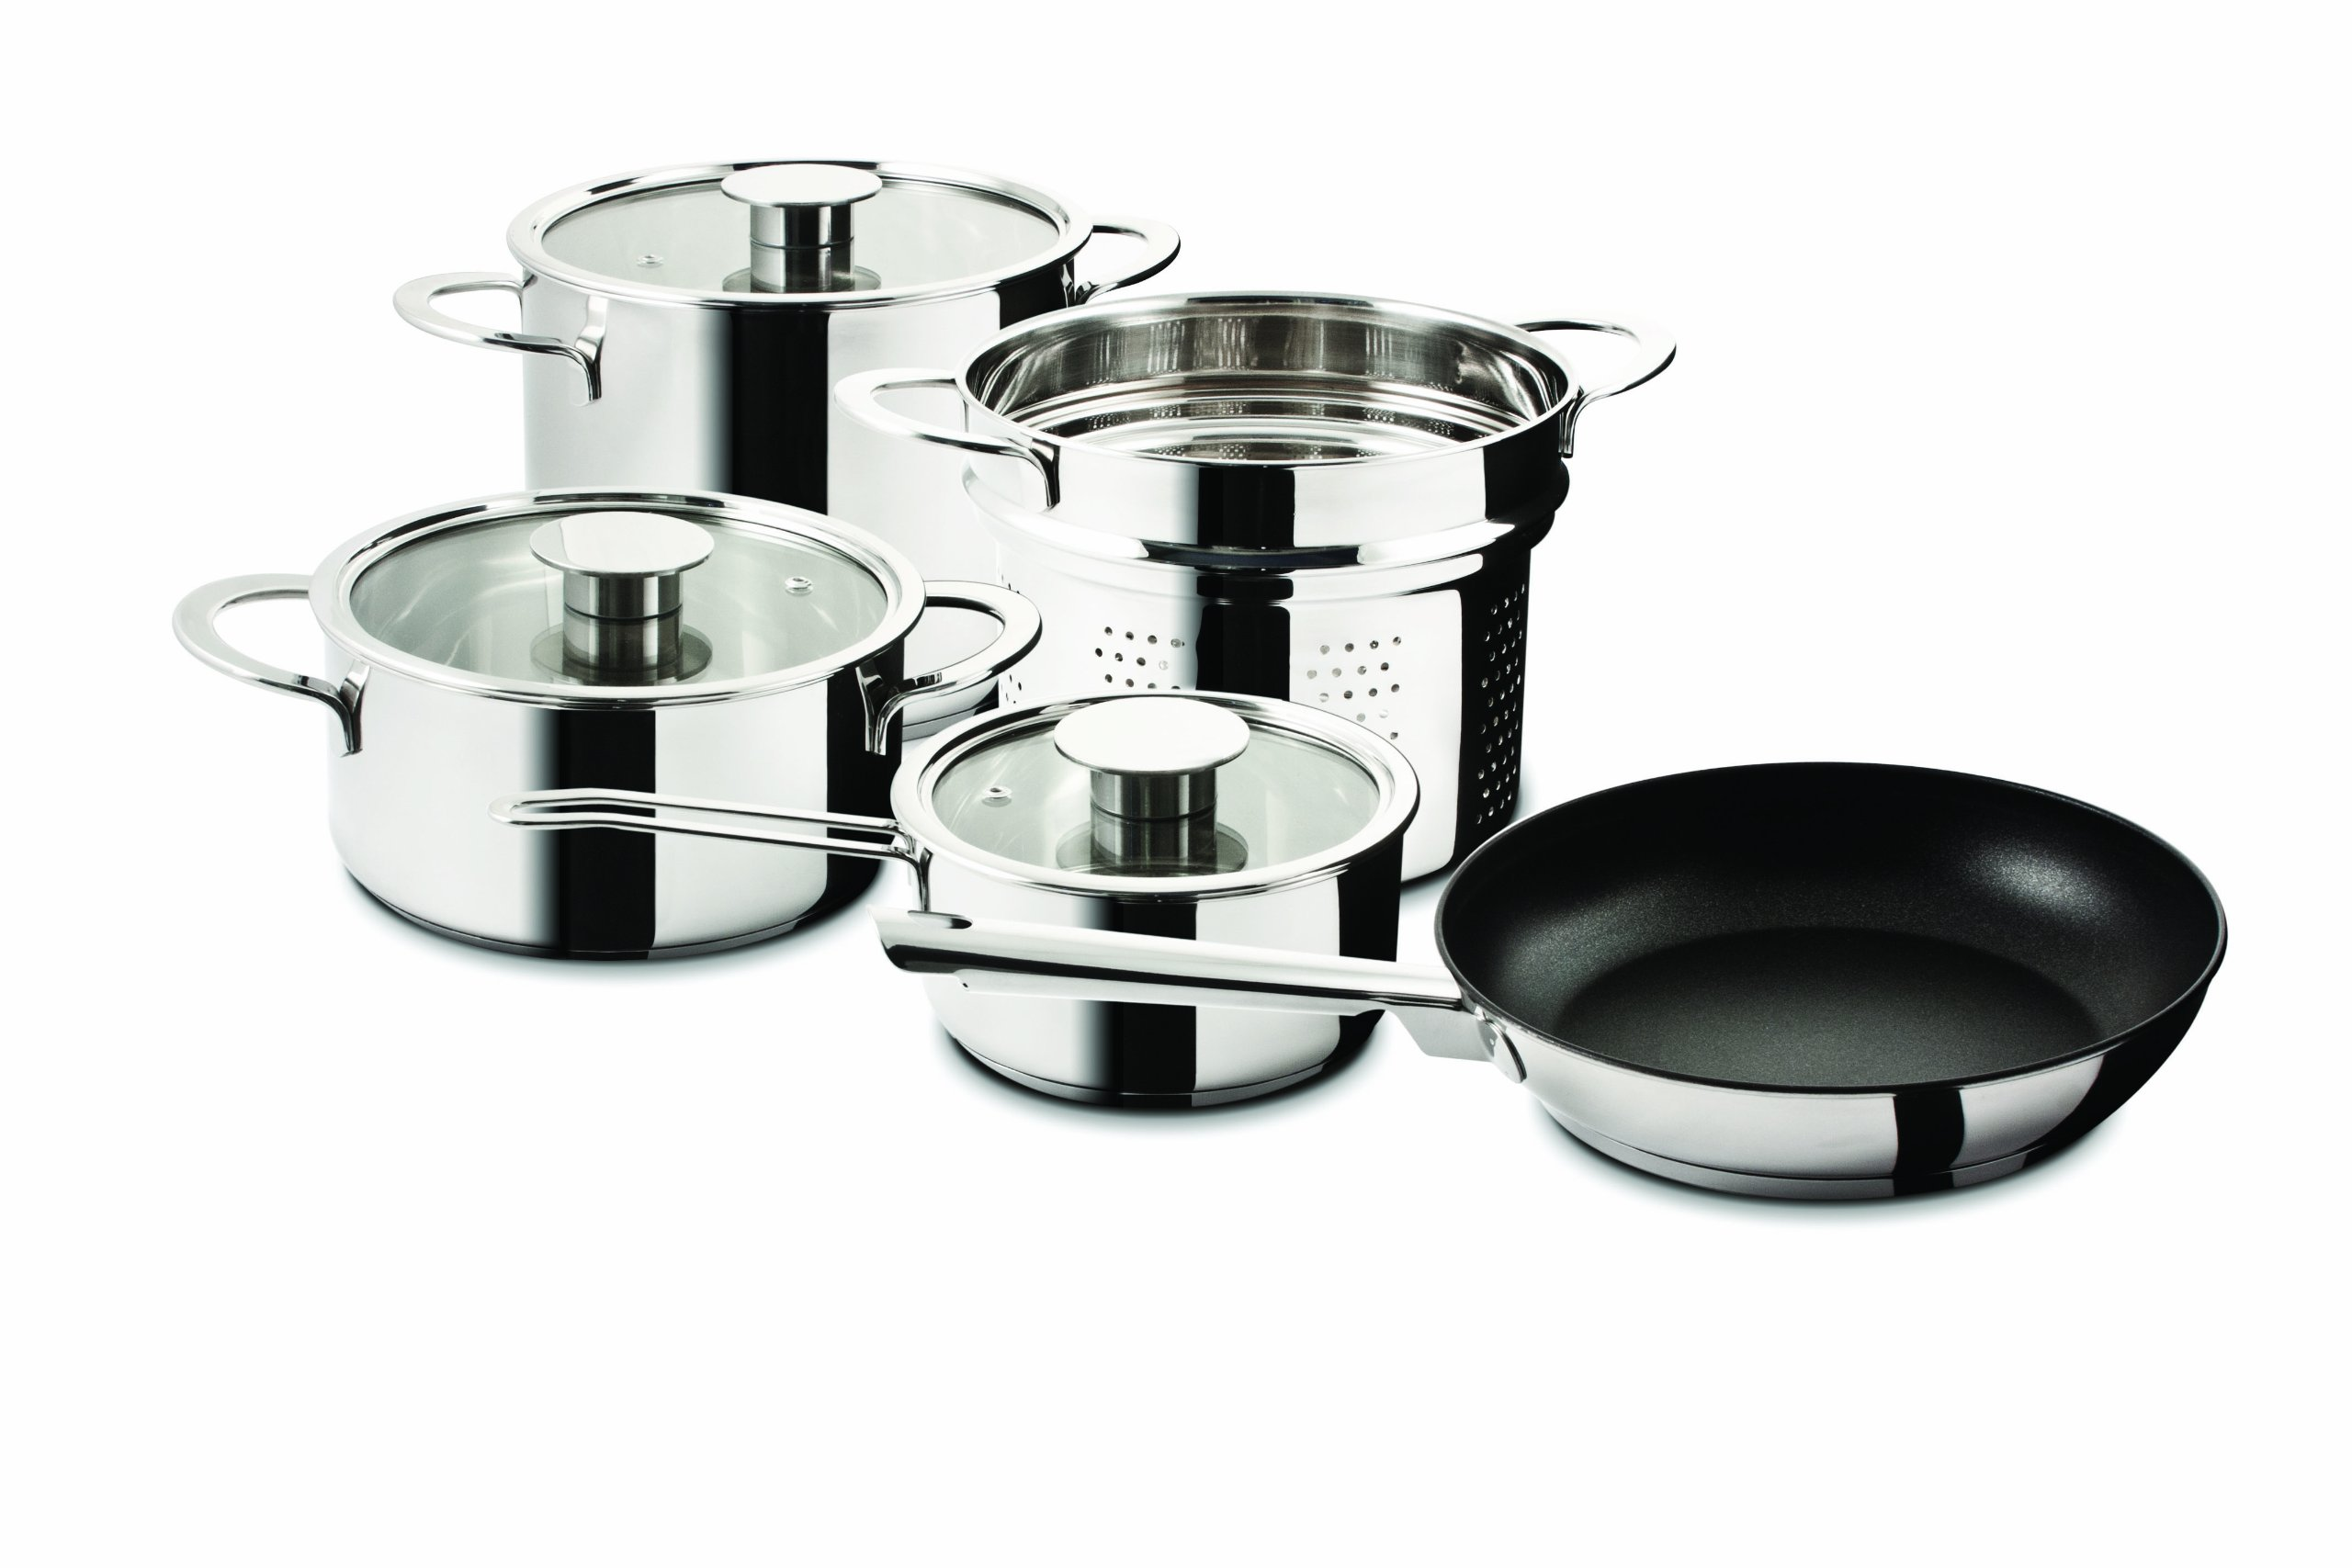 Mepra Gourmet Everyday Cookware Set by MEPRA